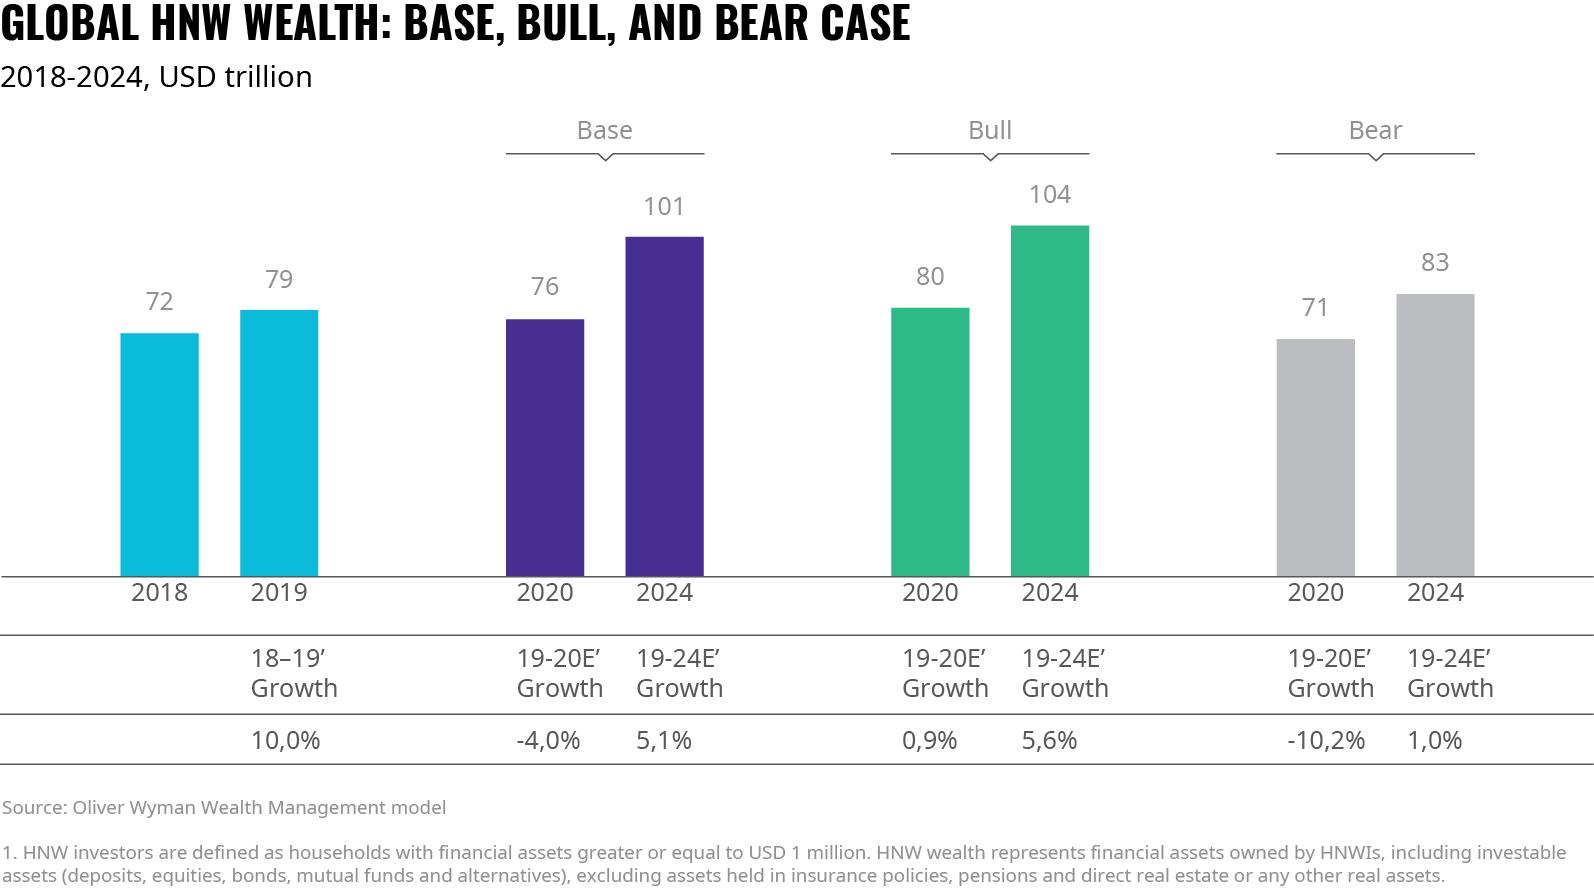 Global High-Net-Worth Individual Wealth Growth Scenarios